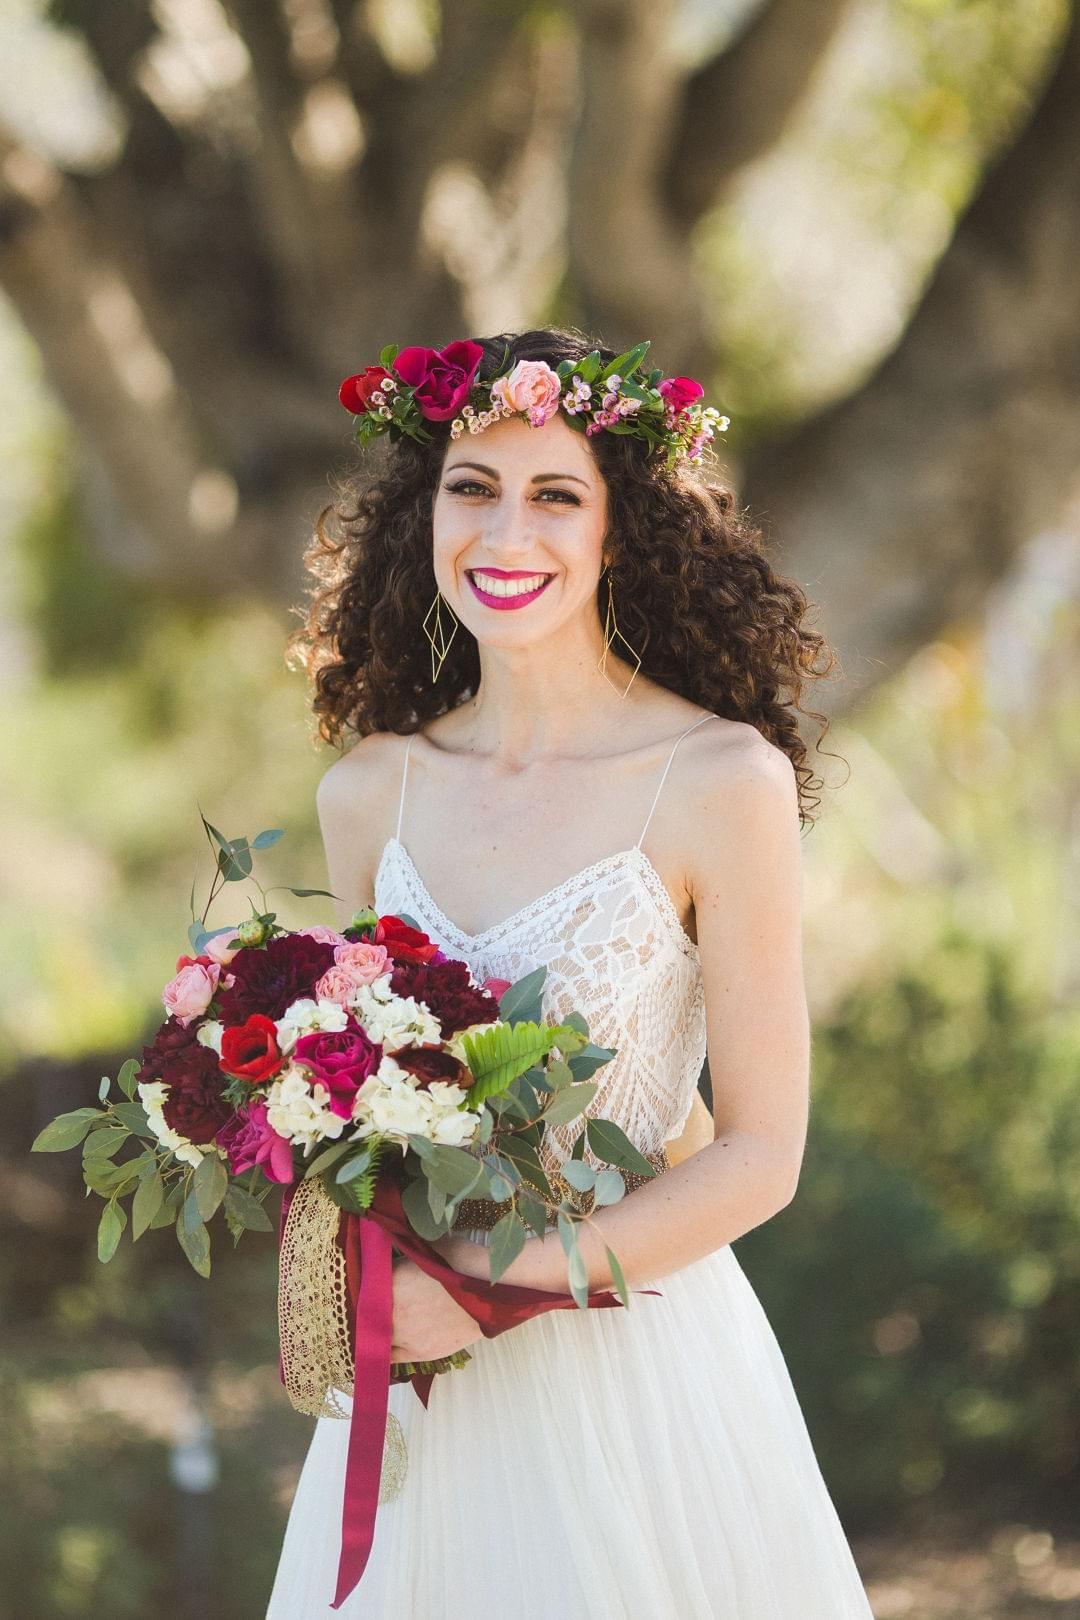 Boho Bride Flower Crown Spaghetti Strap Wedding Dress Red